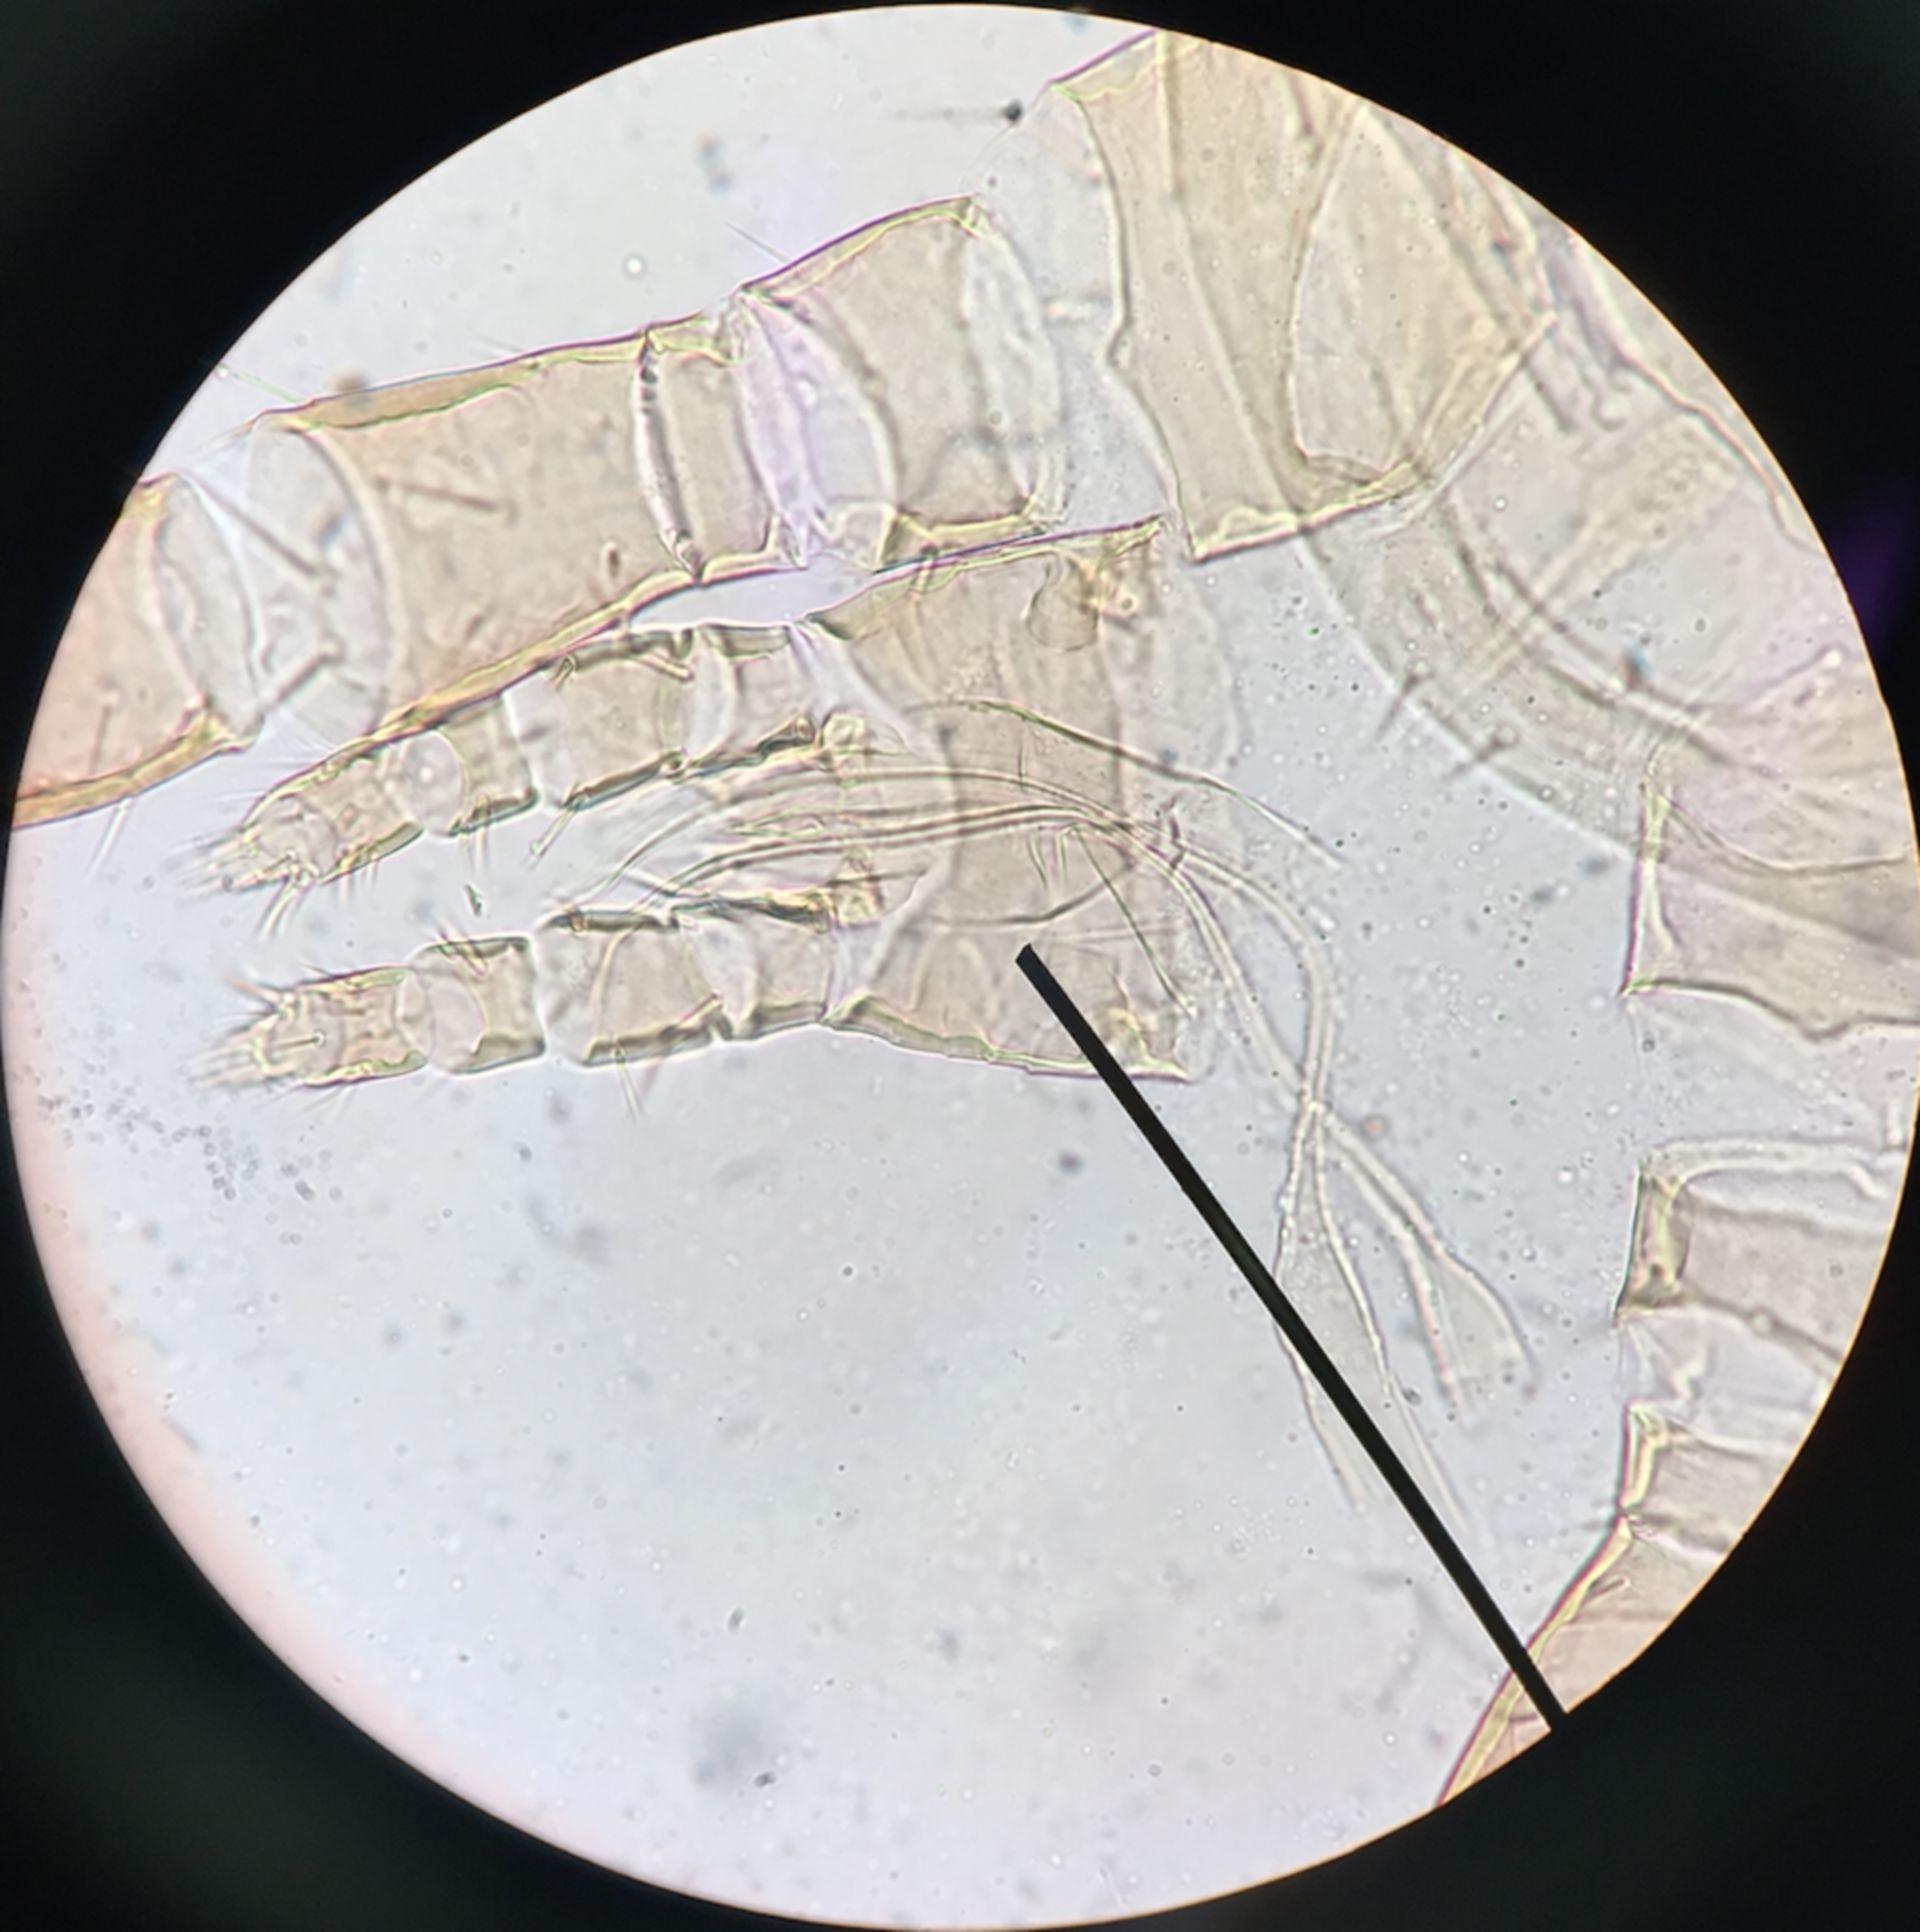 Dermanyssus gallinae (3/3)